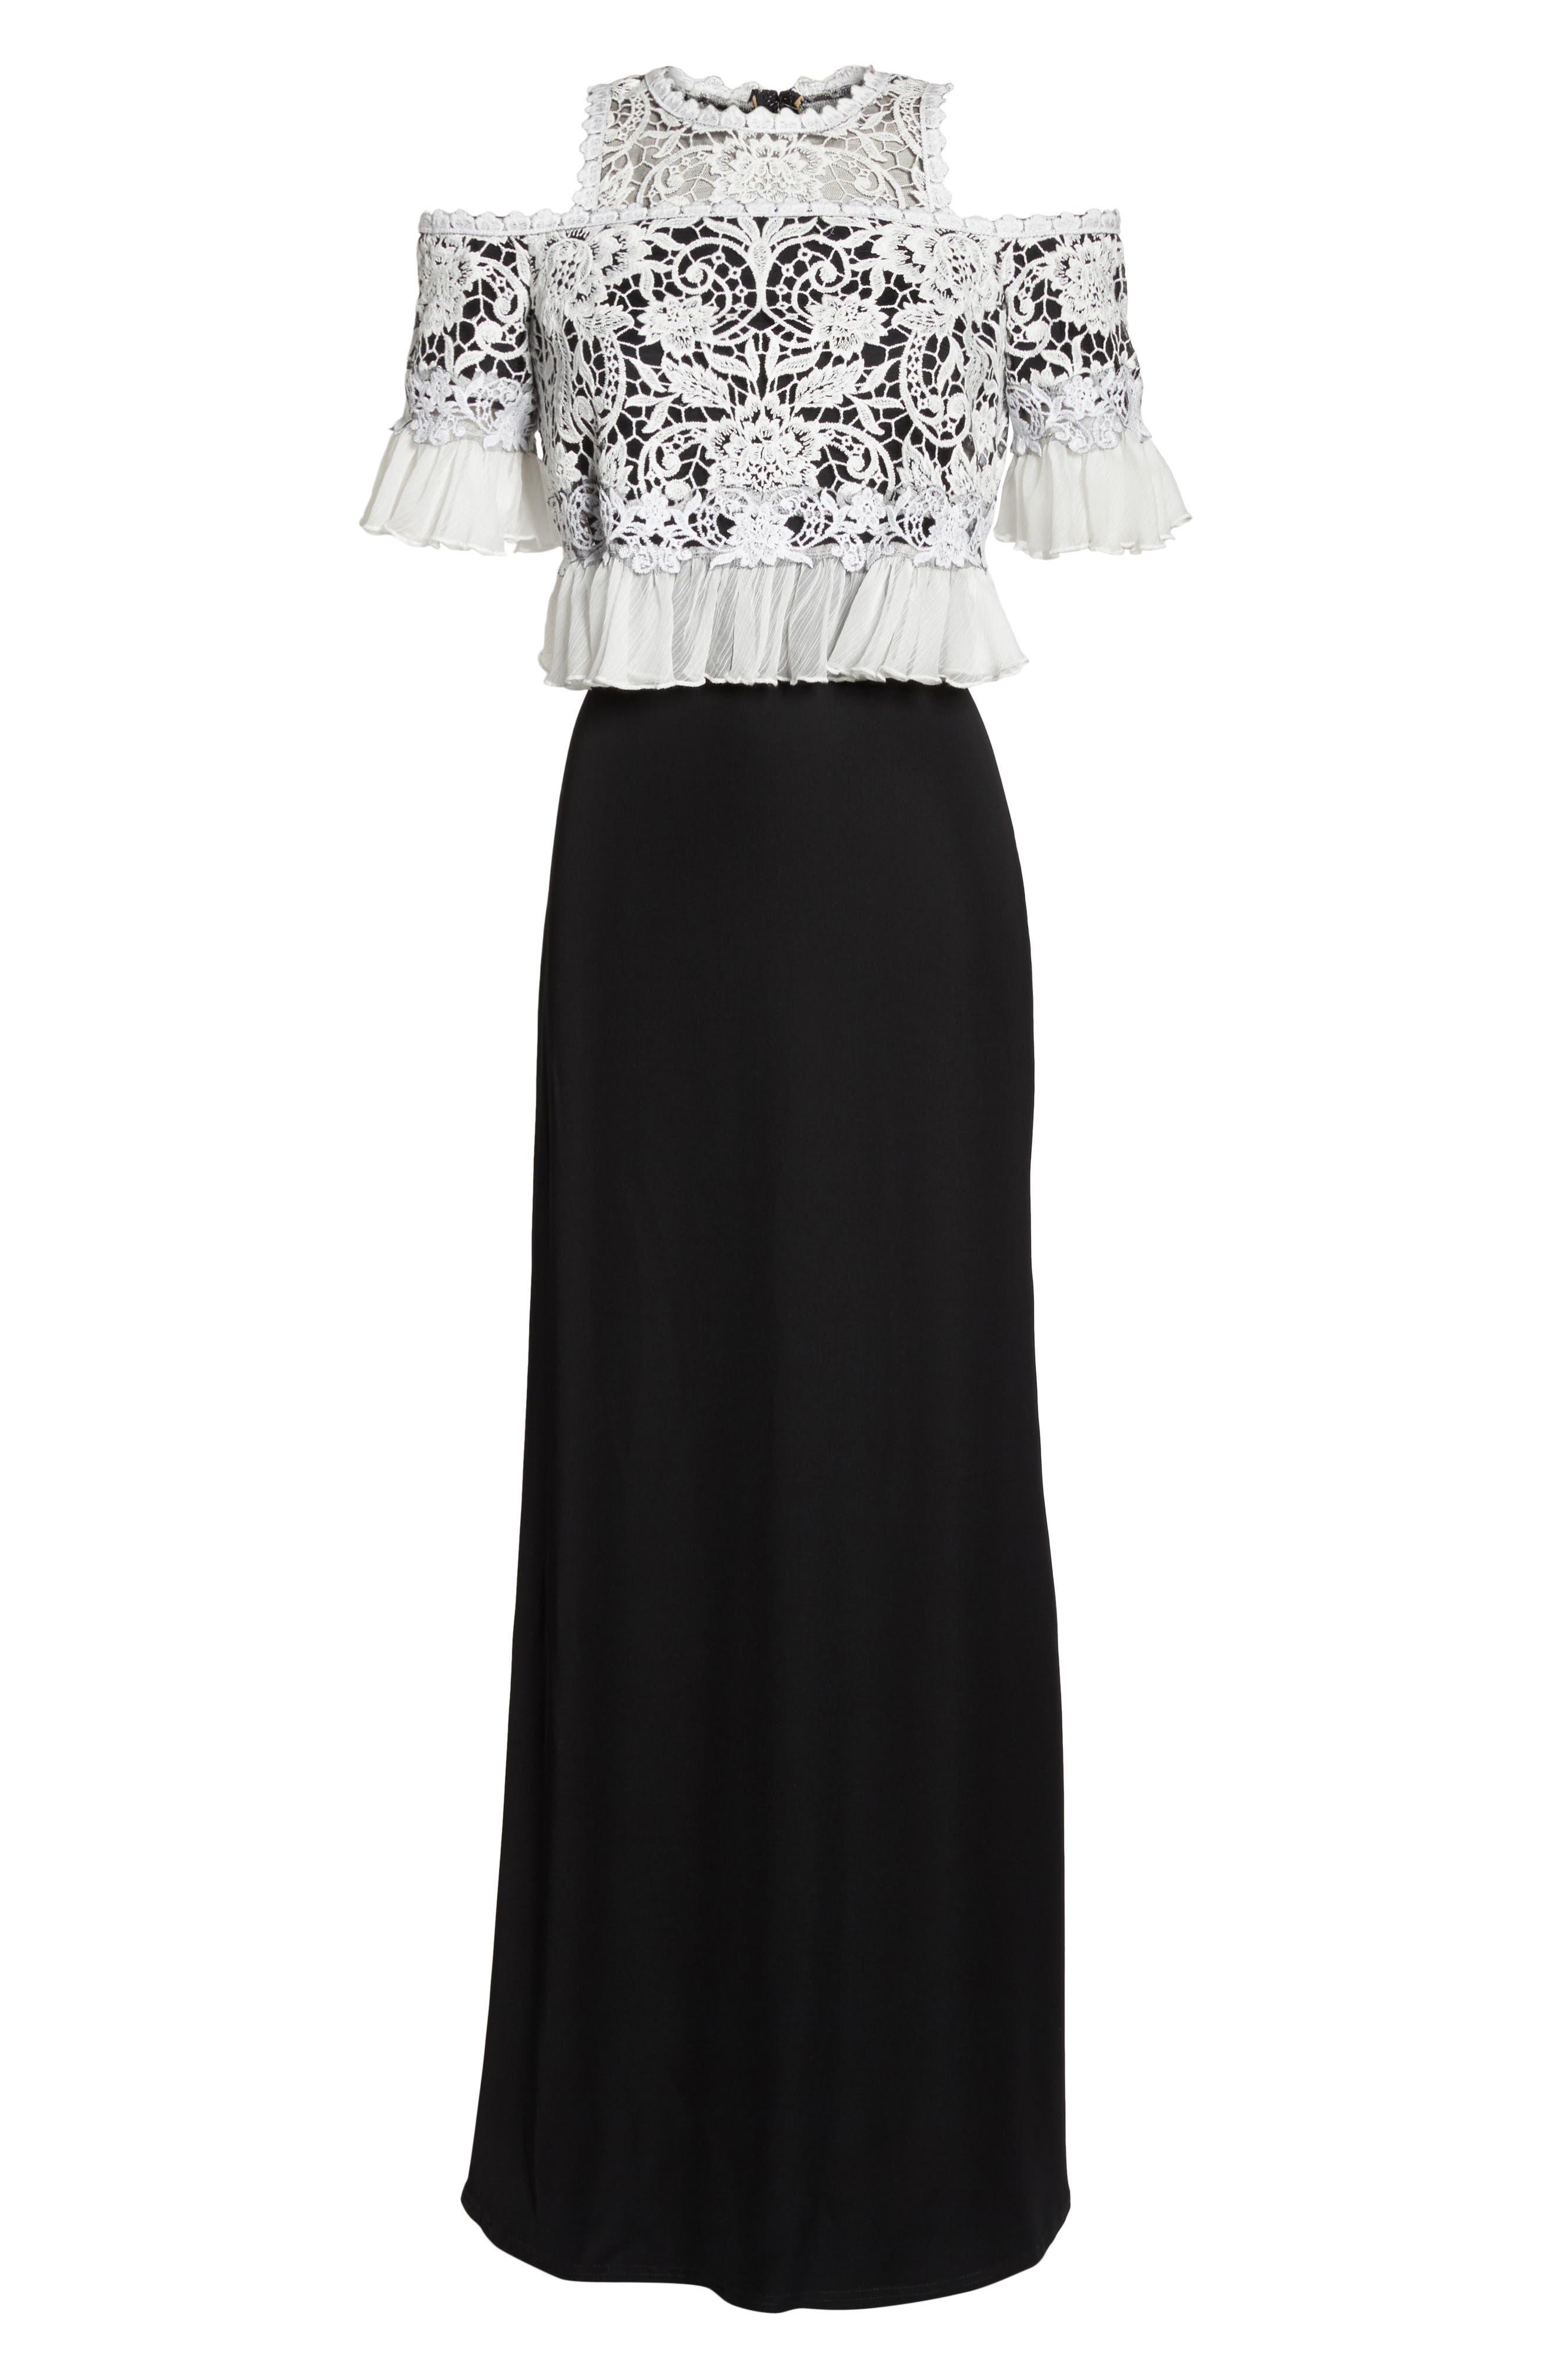 Crochet Bodice Gown,                             Alternate thumbnail 6, color,                             Black/ Ivory